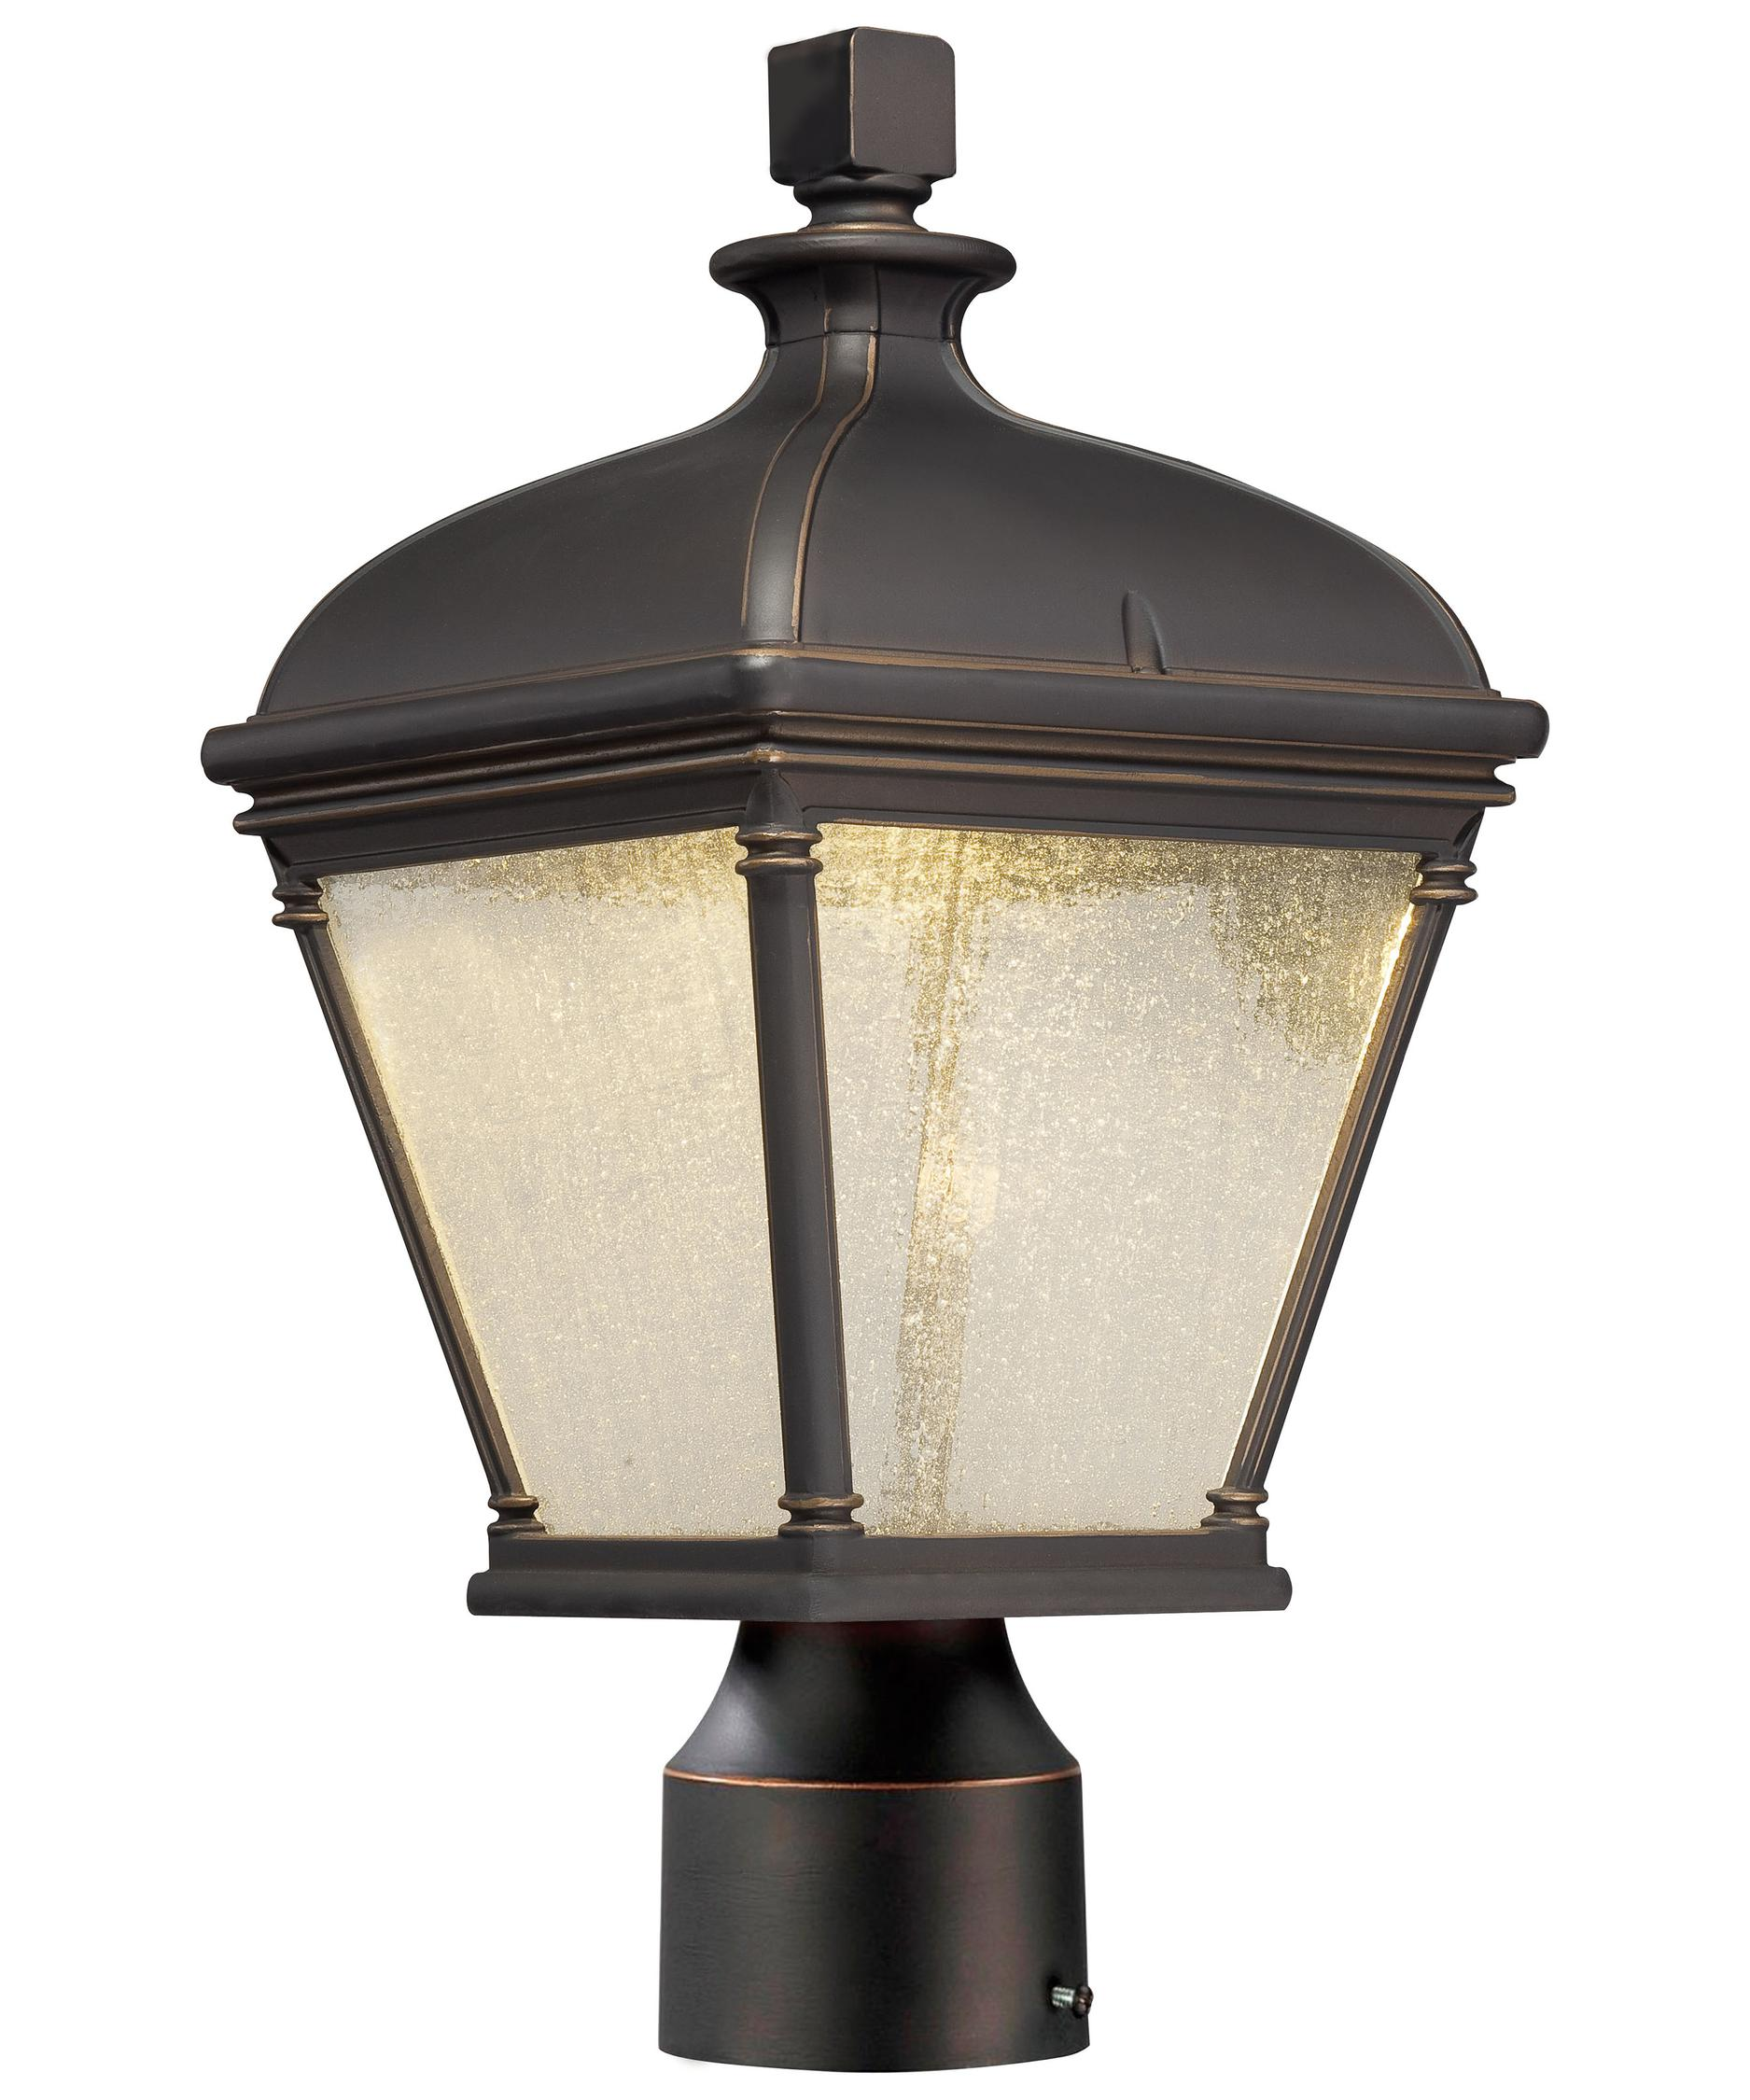 Minka Lavery 72396 Lauriston Manor 9 Inch Wide 1 Light Outdoor Post Lamp |  Capitol Lighting 1 800lighting.com